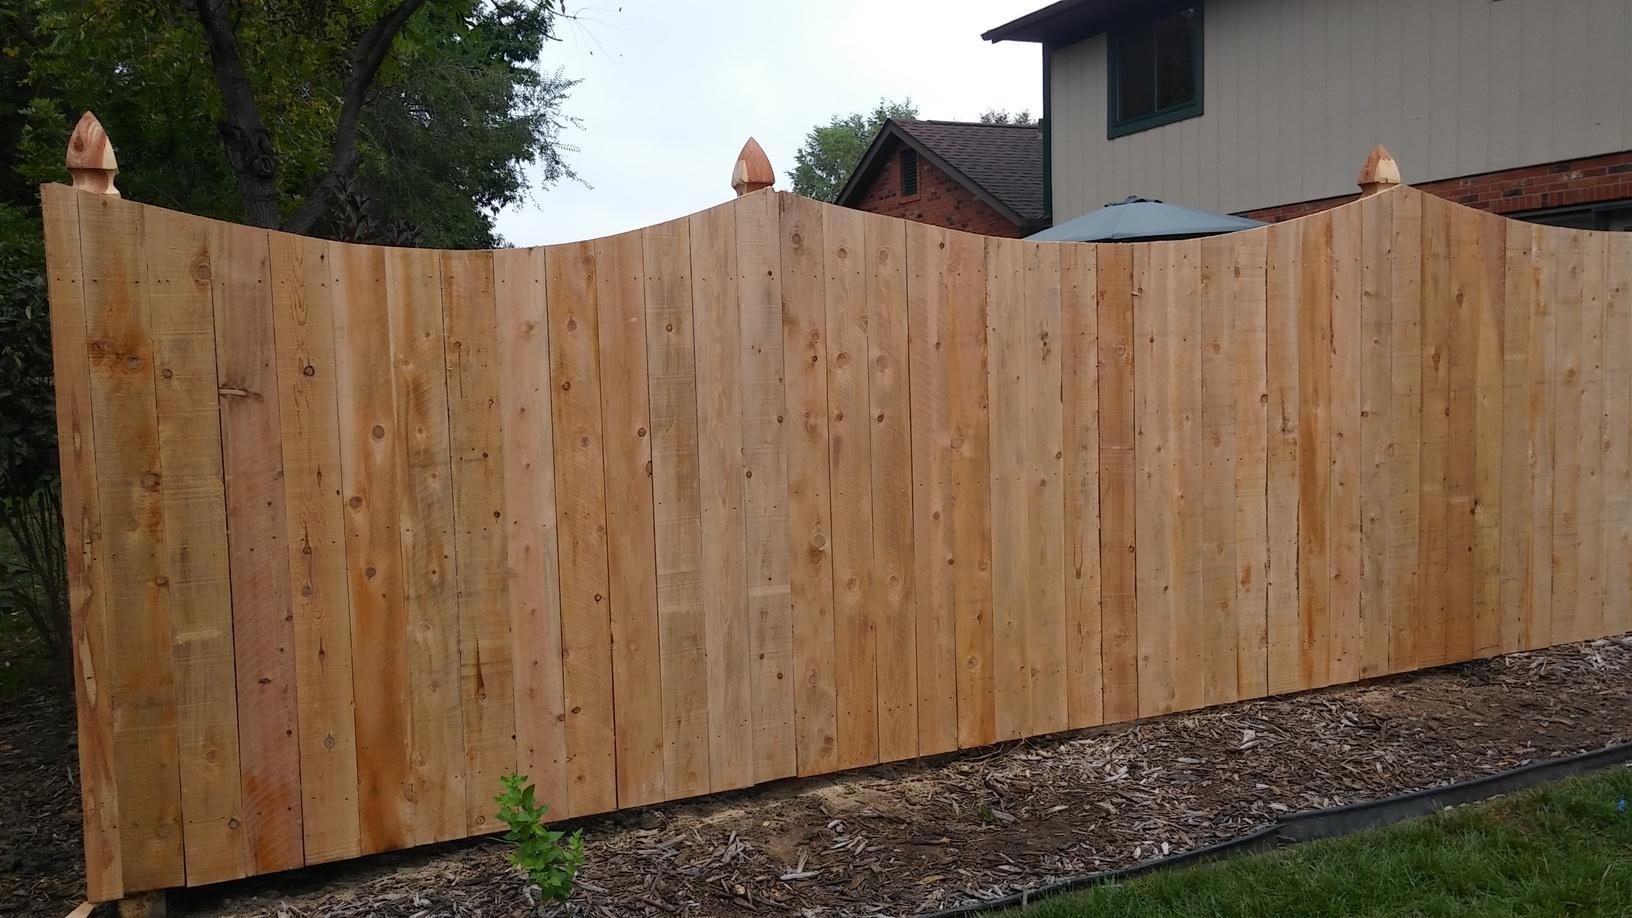 O'Fallon, IL Cedar Privacy Fence Installation - After Photo